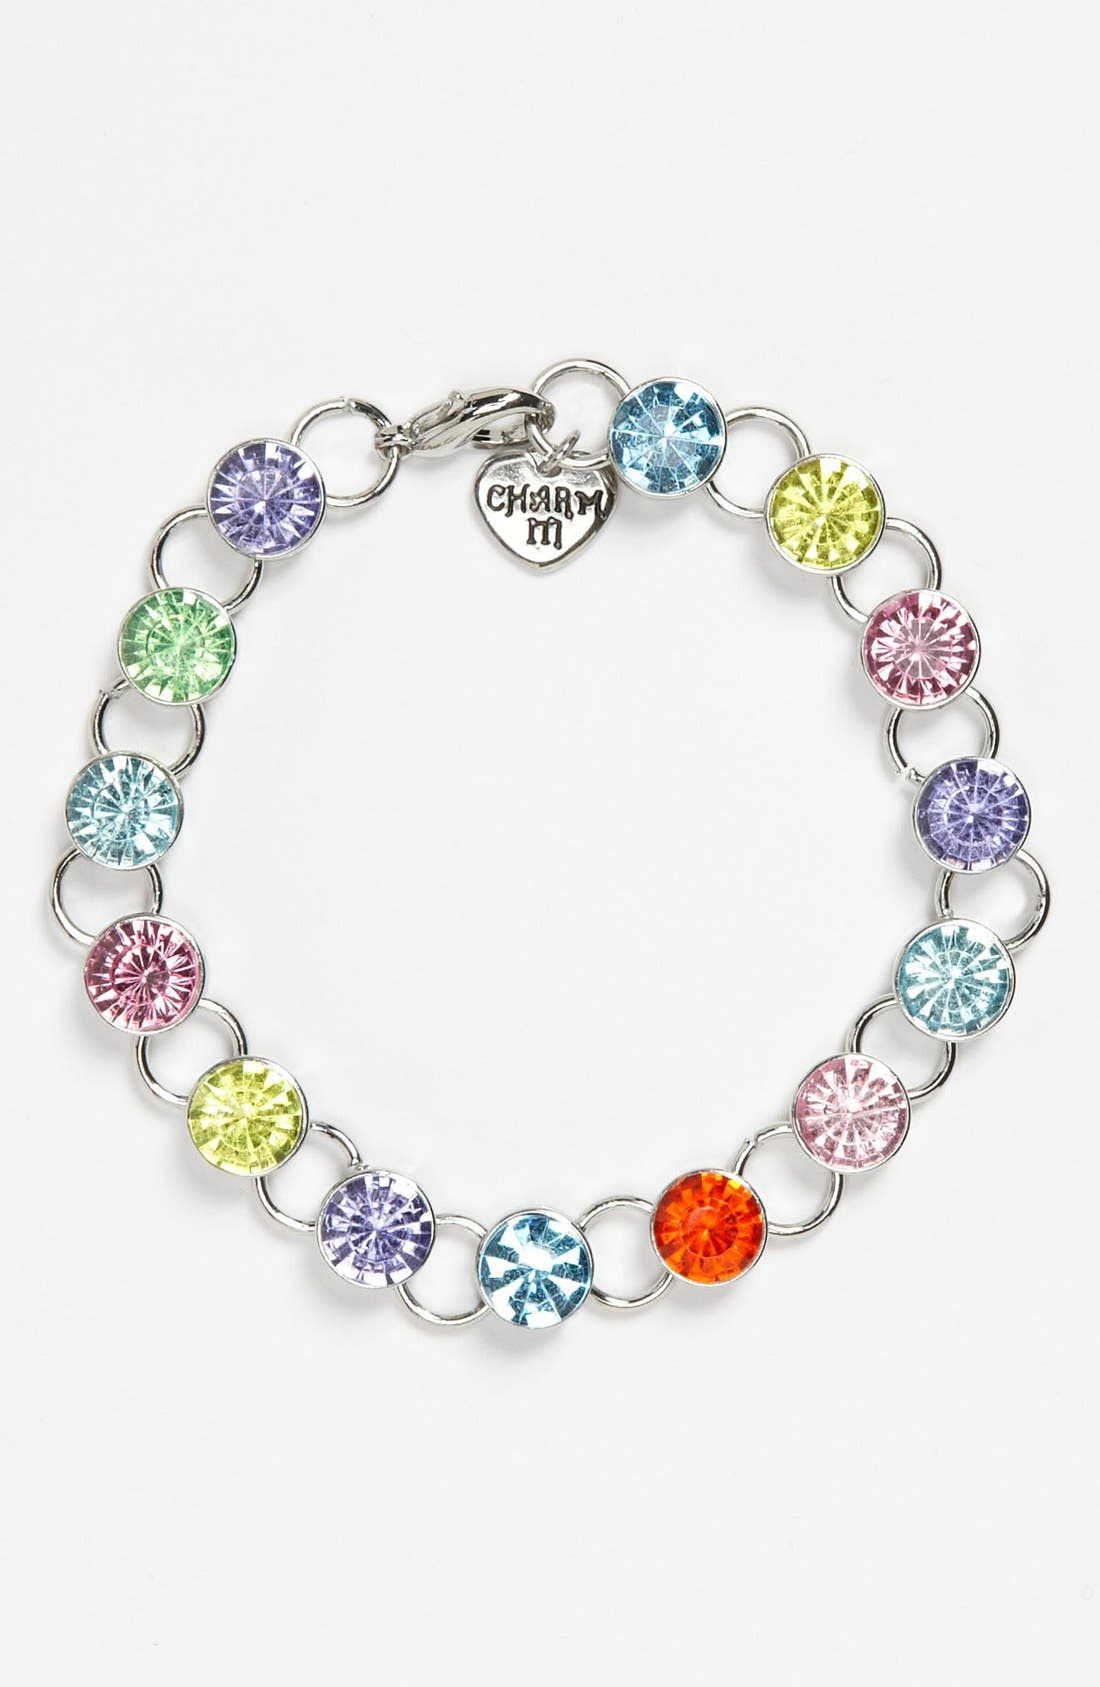 Alternate Image 1 Selected - CHARM IT!® Link Bracelet (Girls)